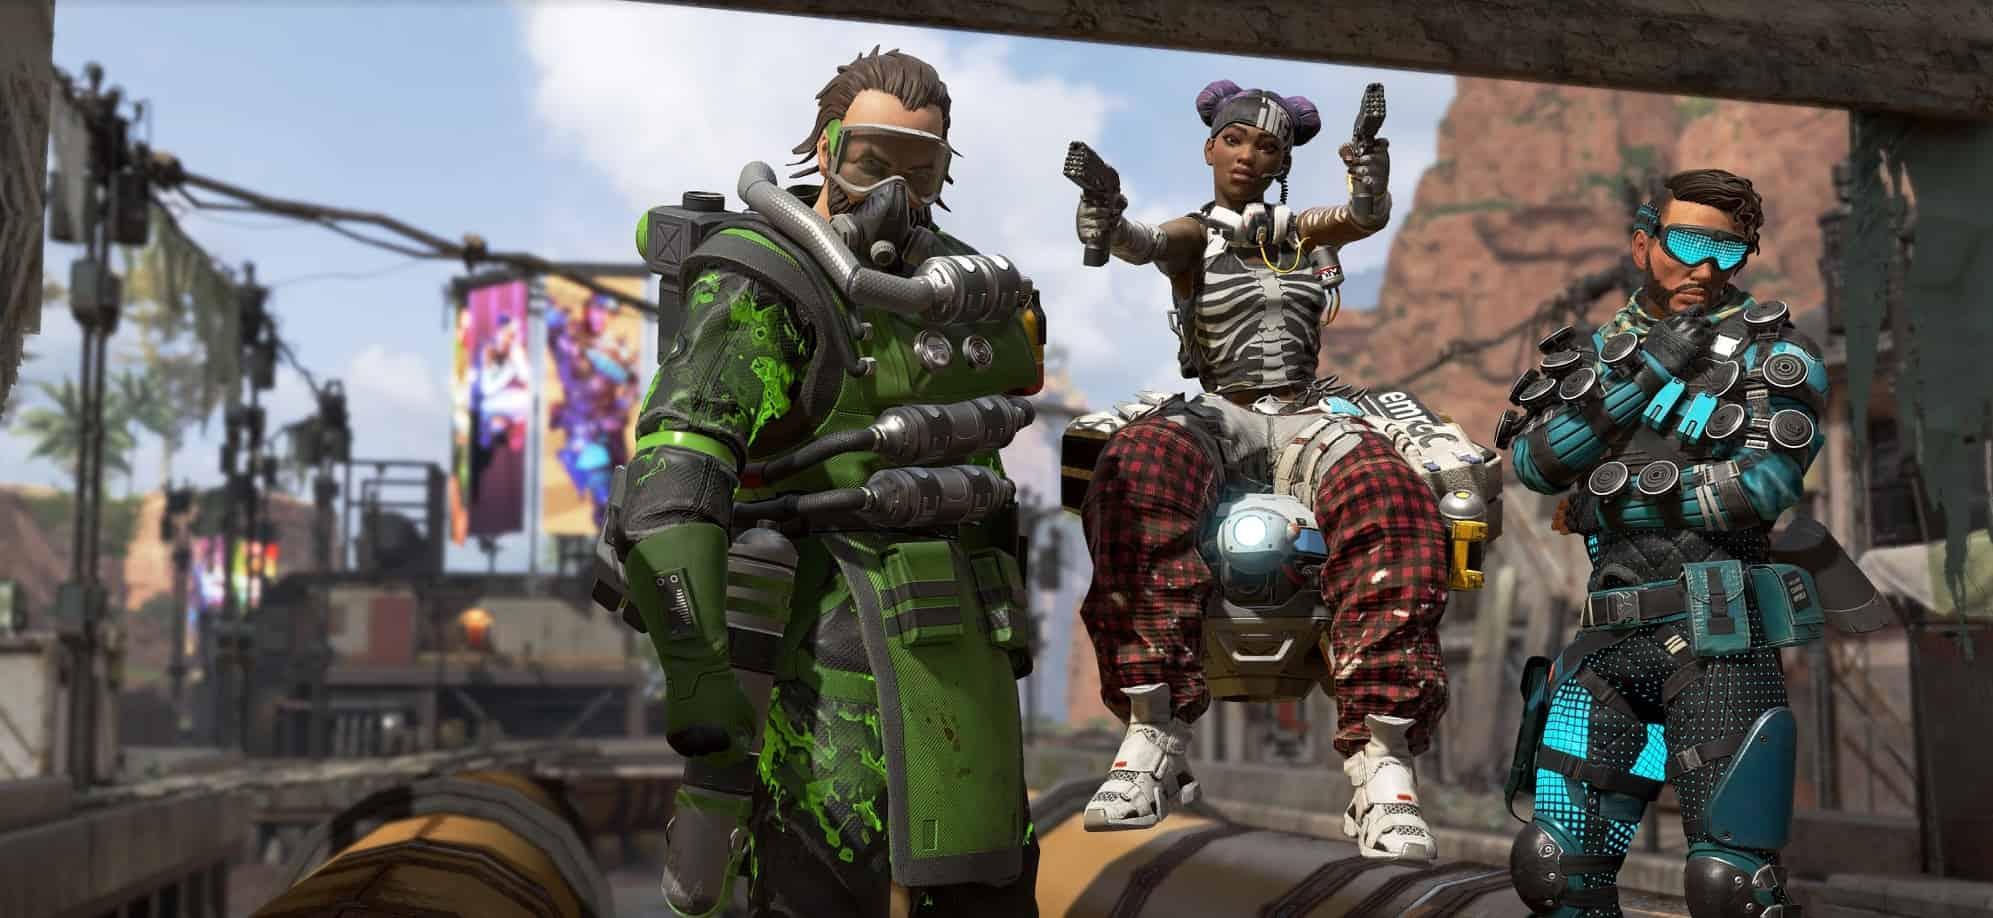 Photo of Titanfall's battle royale Apex Legends revealed – Fortnite killer?